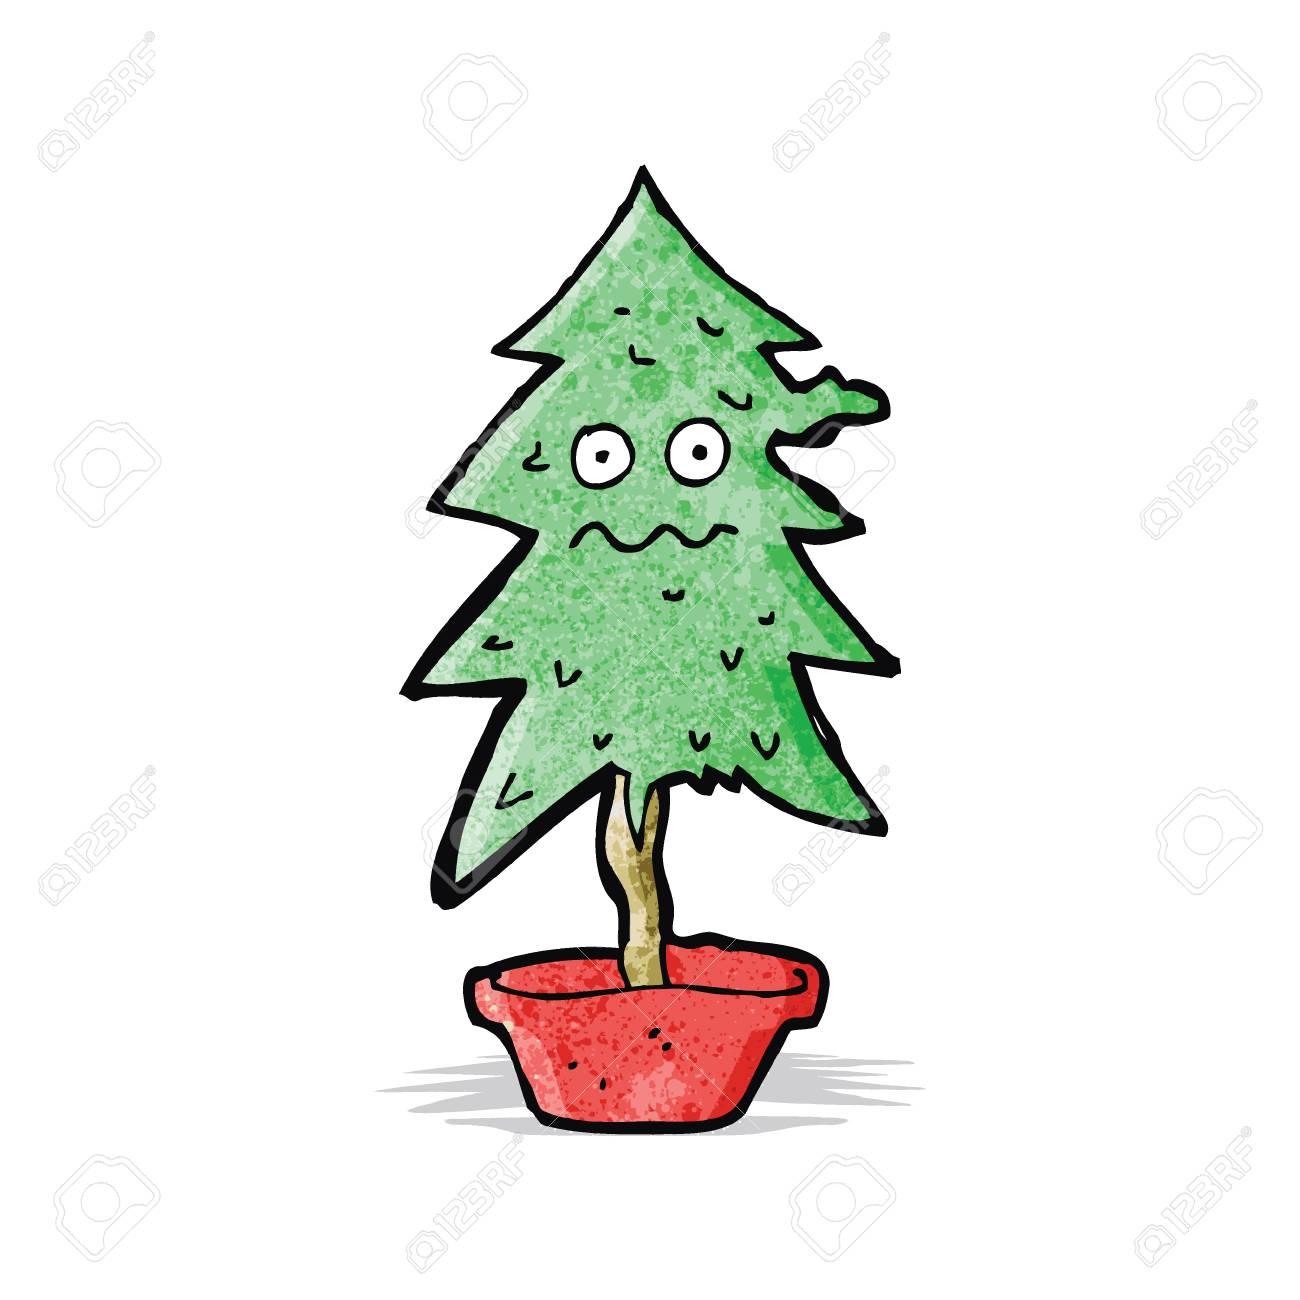 Cartoon Ragged Old Christmas Tree Royalty Free Cliparts, Vectors ...